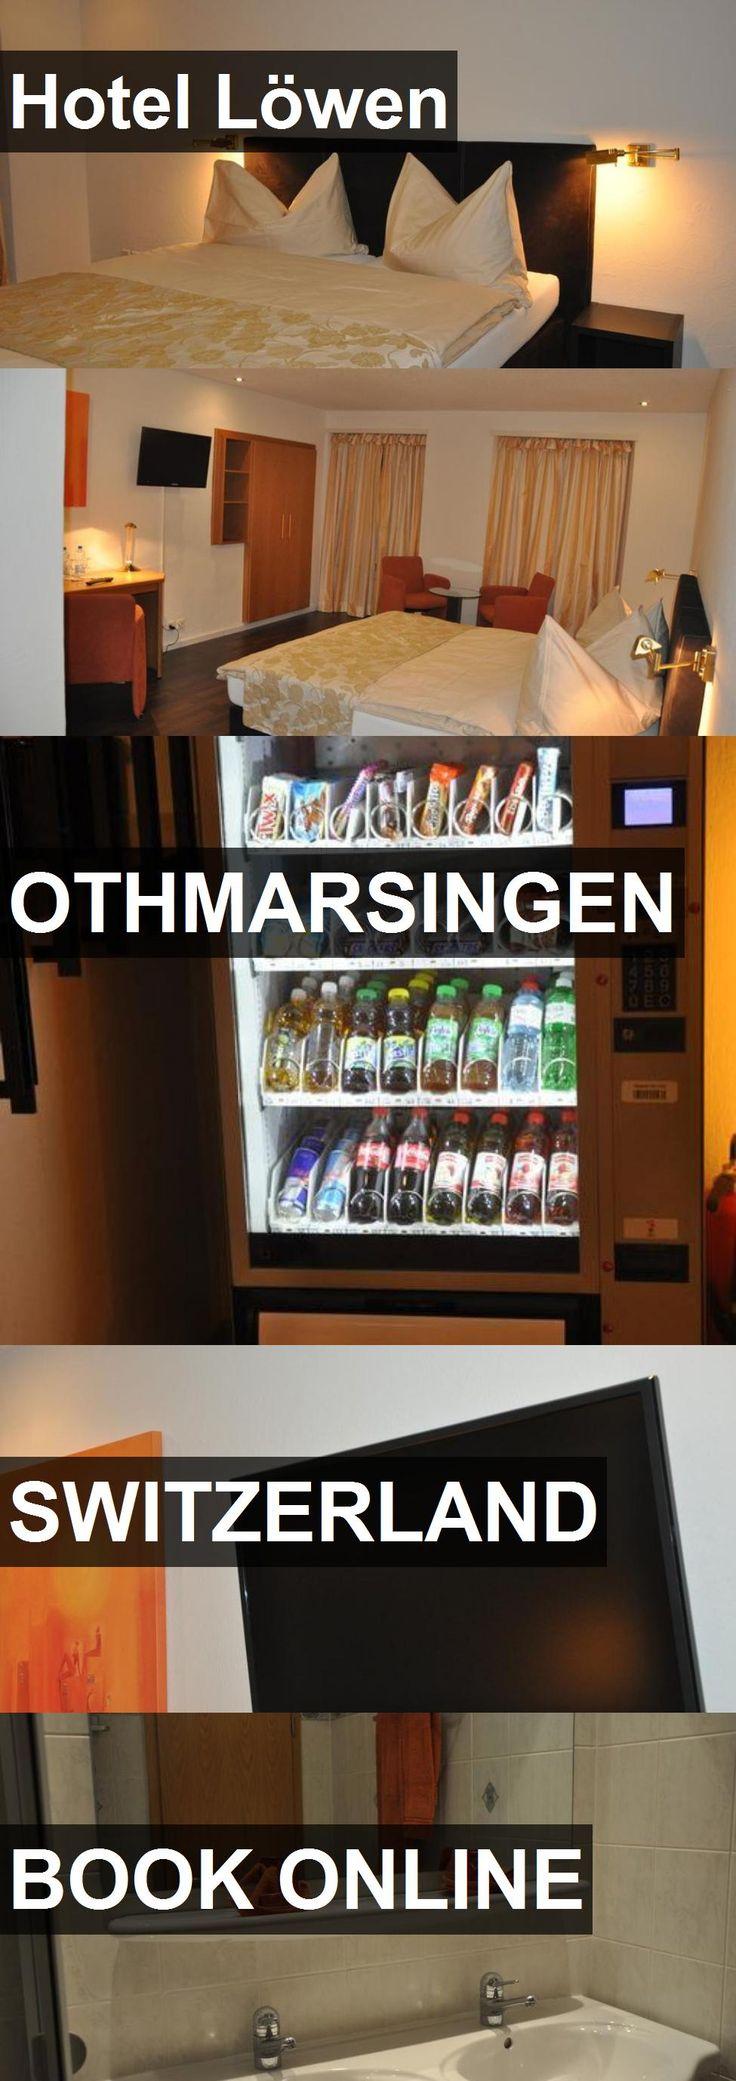 Hotel Löwen in Othmarsingen, Switzerland. For more information, photos, reviews and best prices please follow the link. #Switzerland #Othmarsingen #travel #vacation #hotel